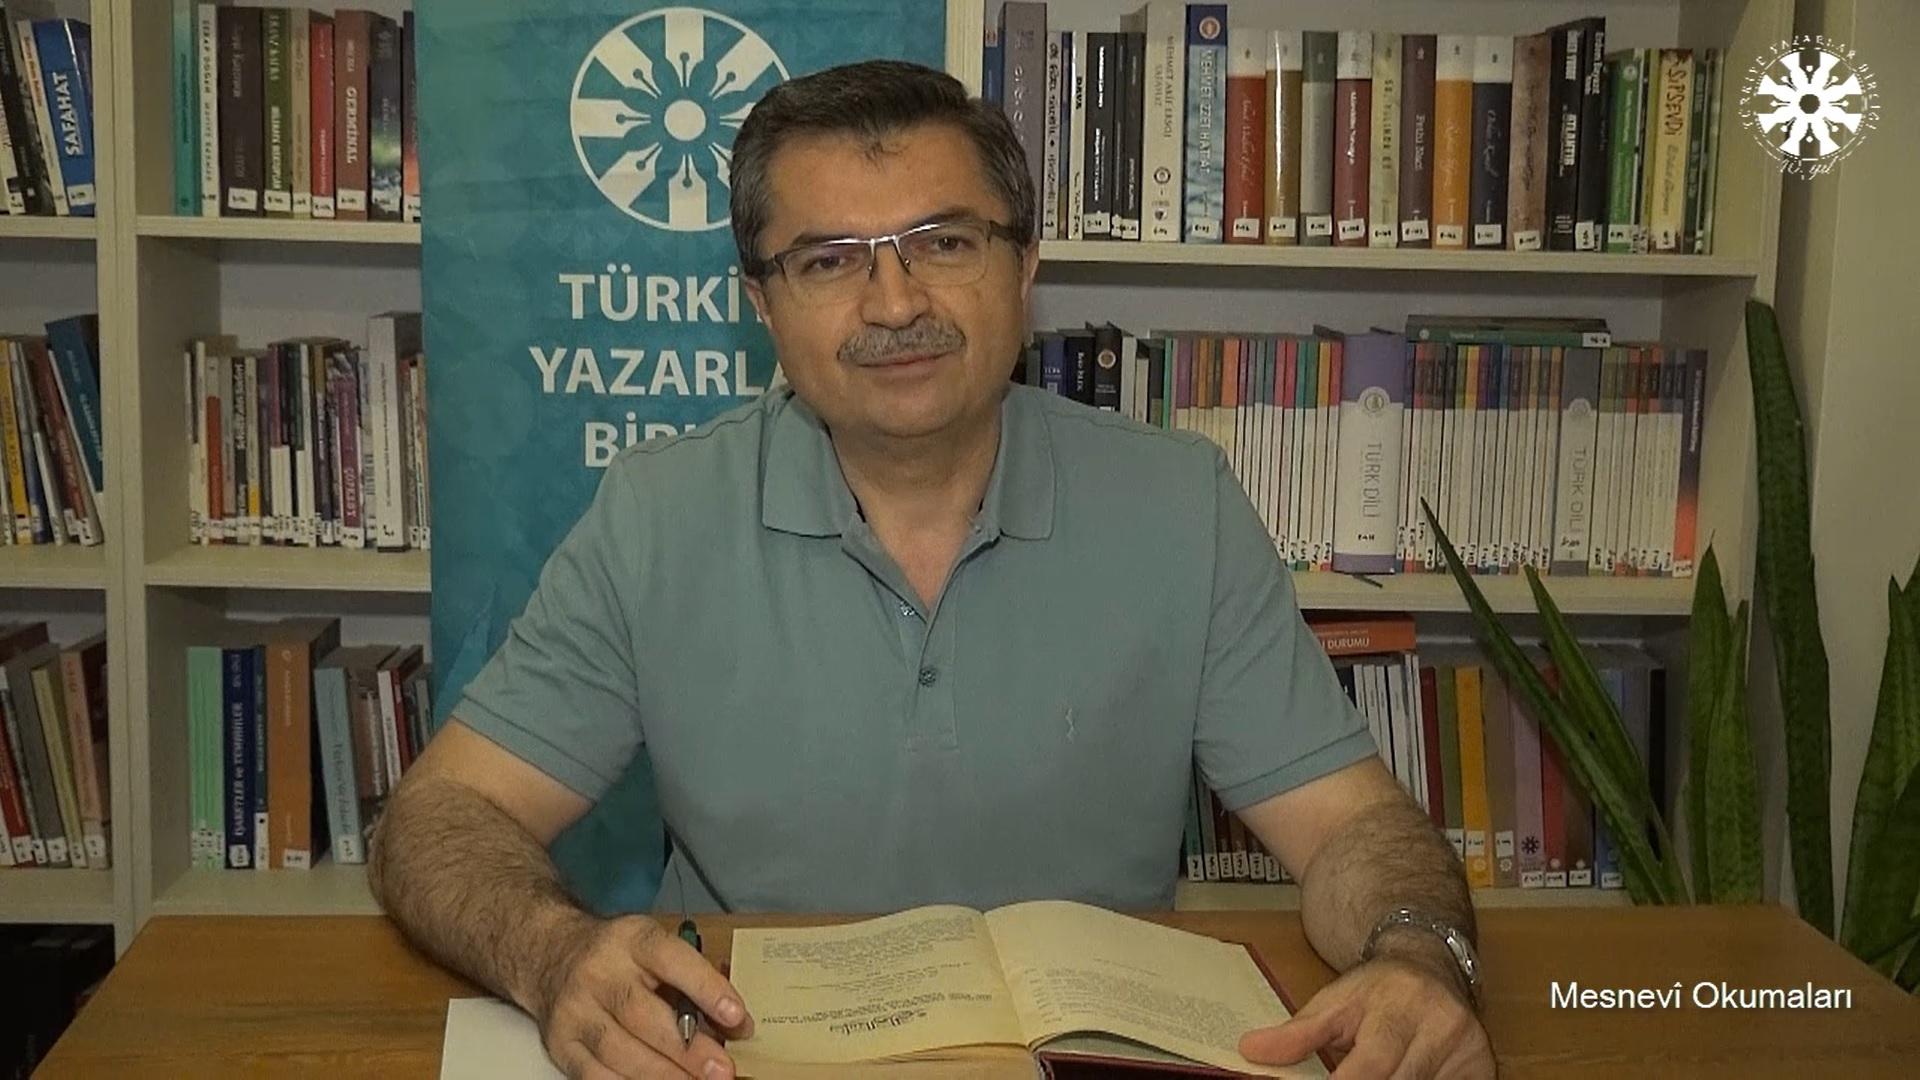 Mesnevî Okumaları -66- Dr. Fahrettin Coşguner